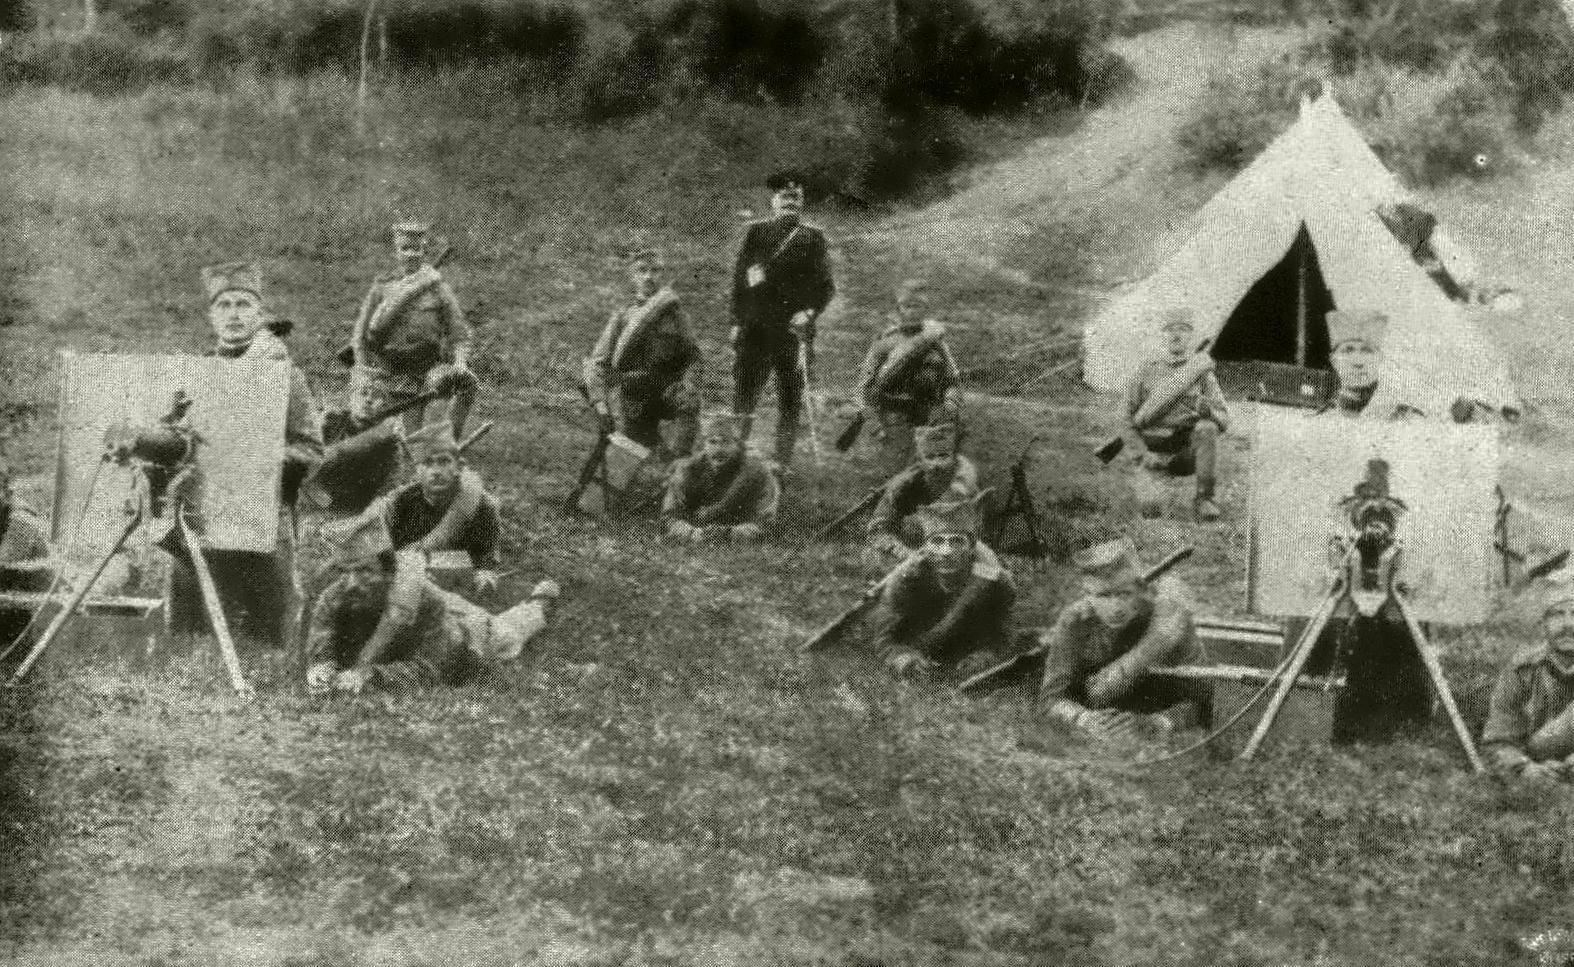 Serb machine gun crews